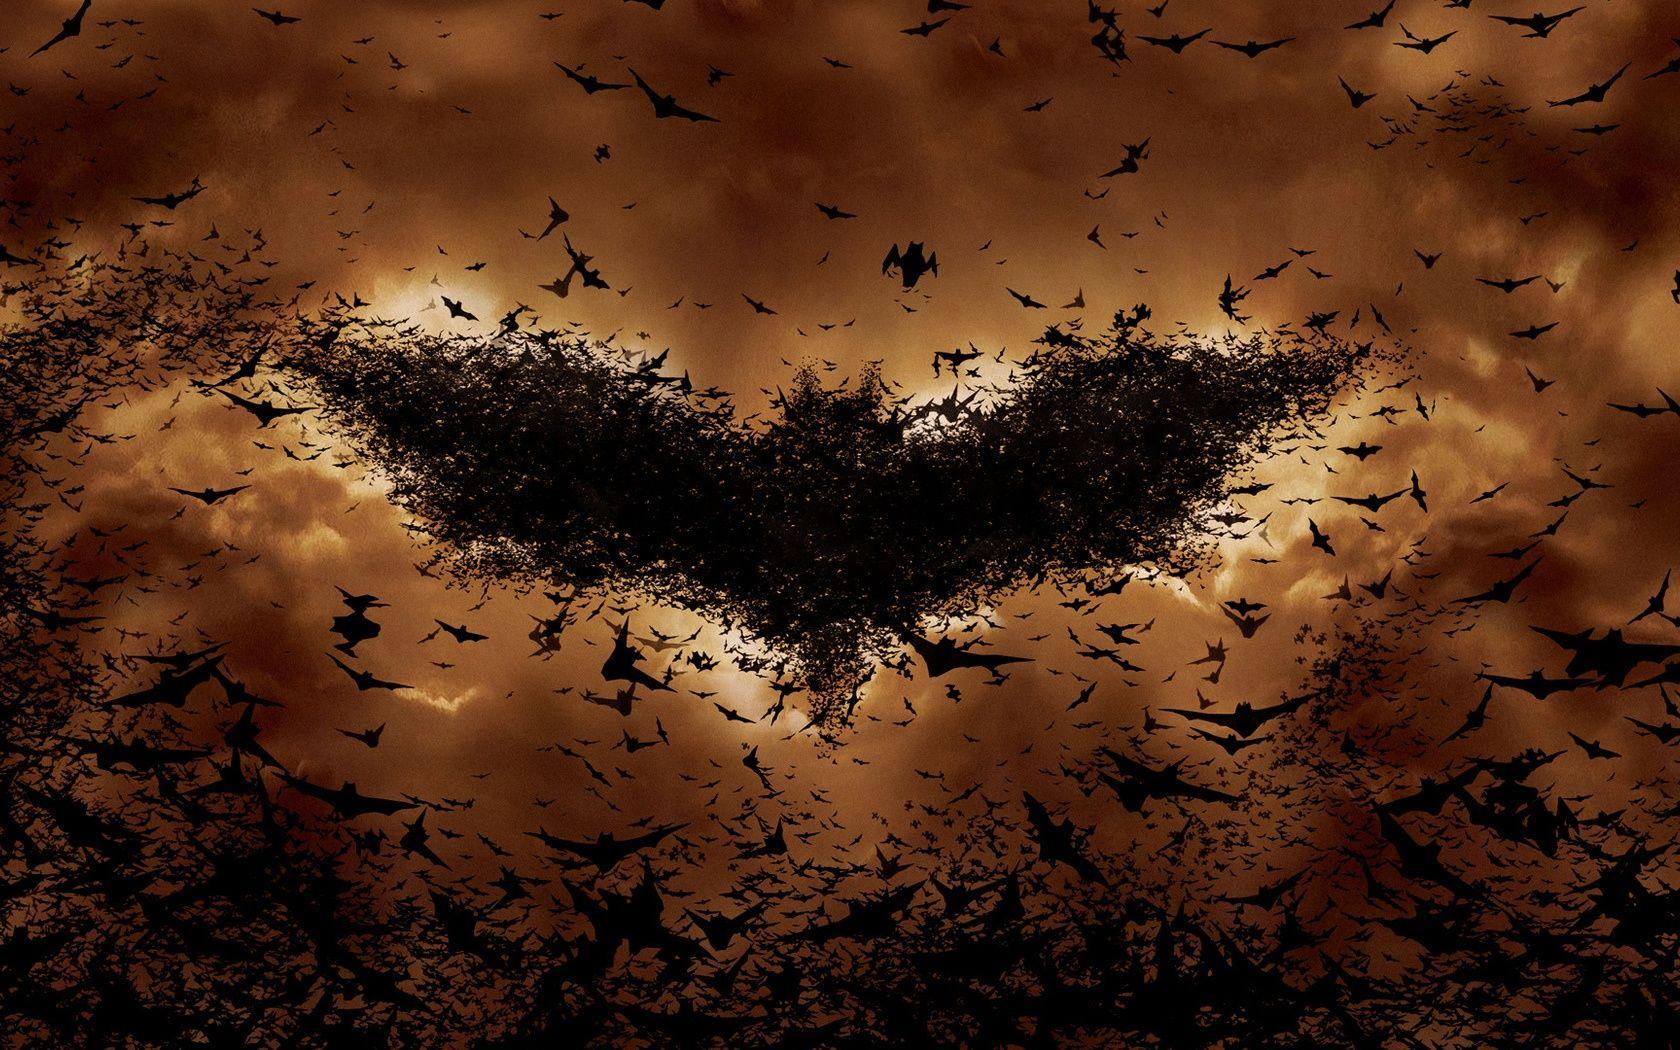 Image For Batman Logo Dark Knight Rises Wallpaper Cool HD